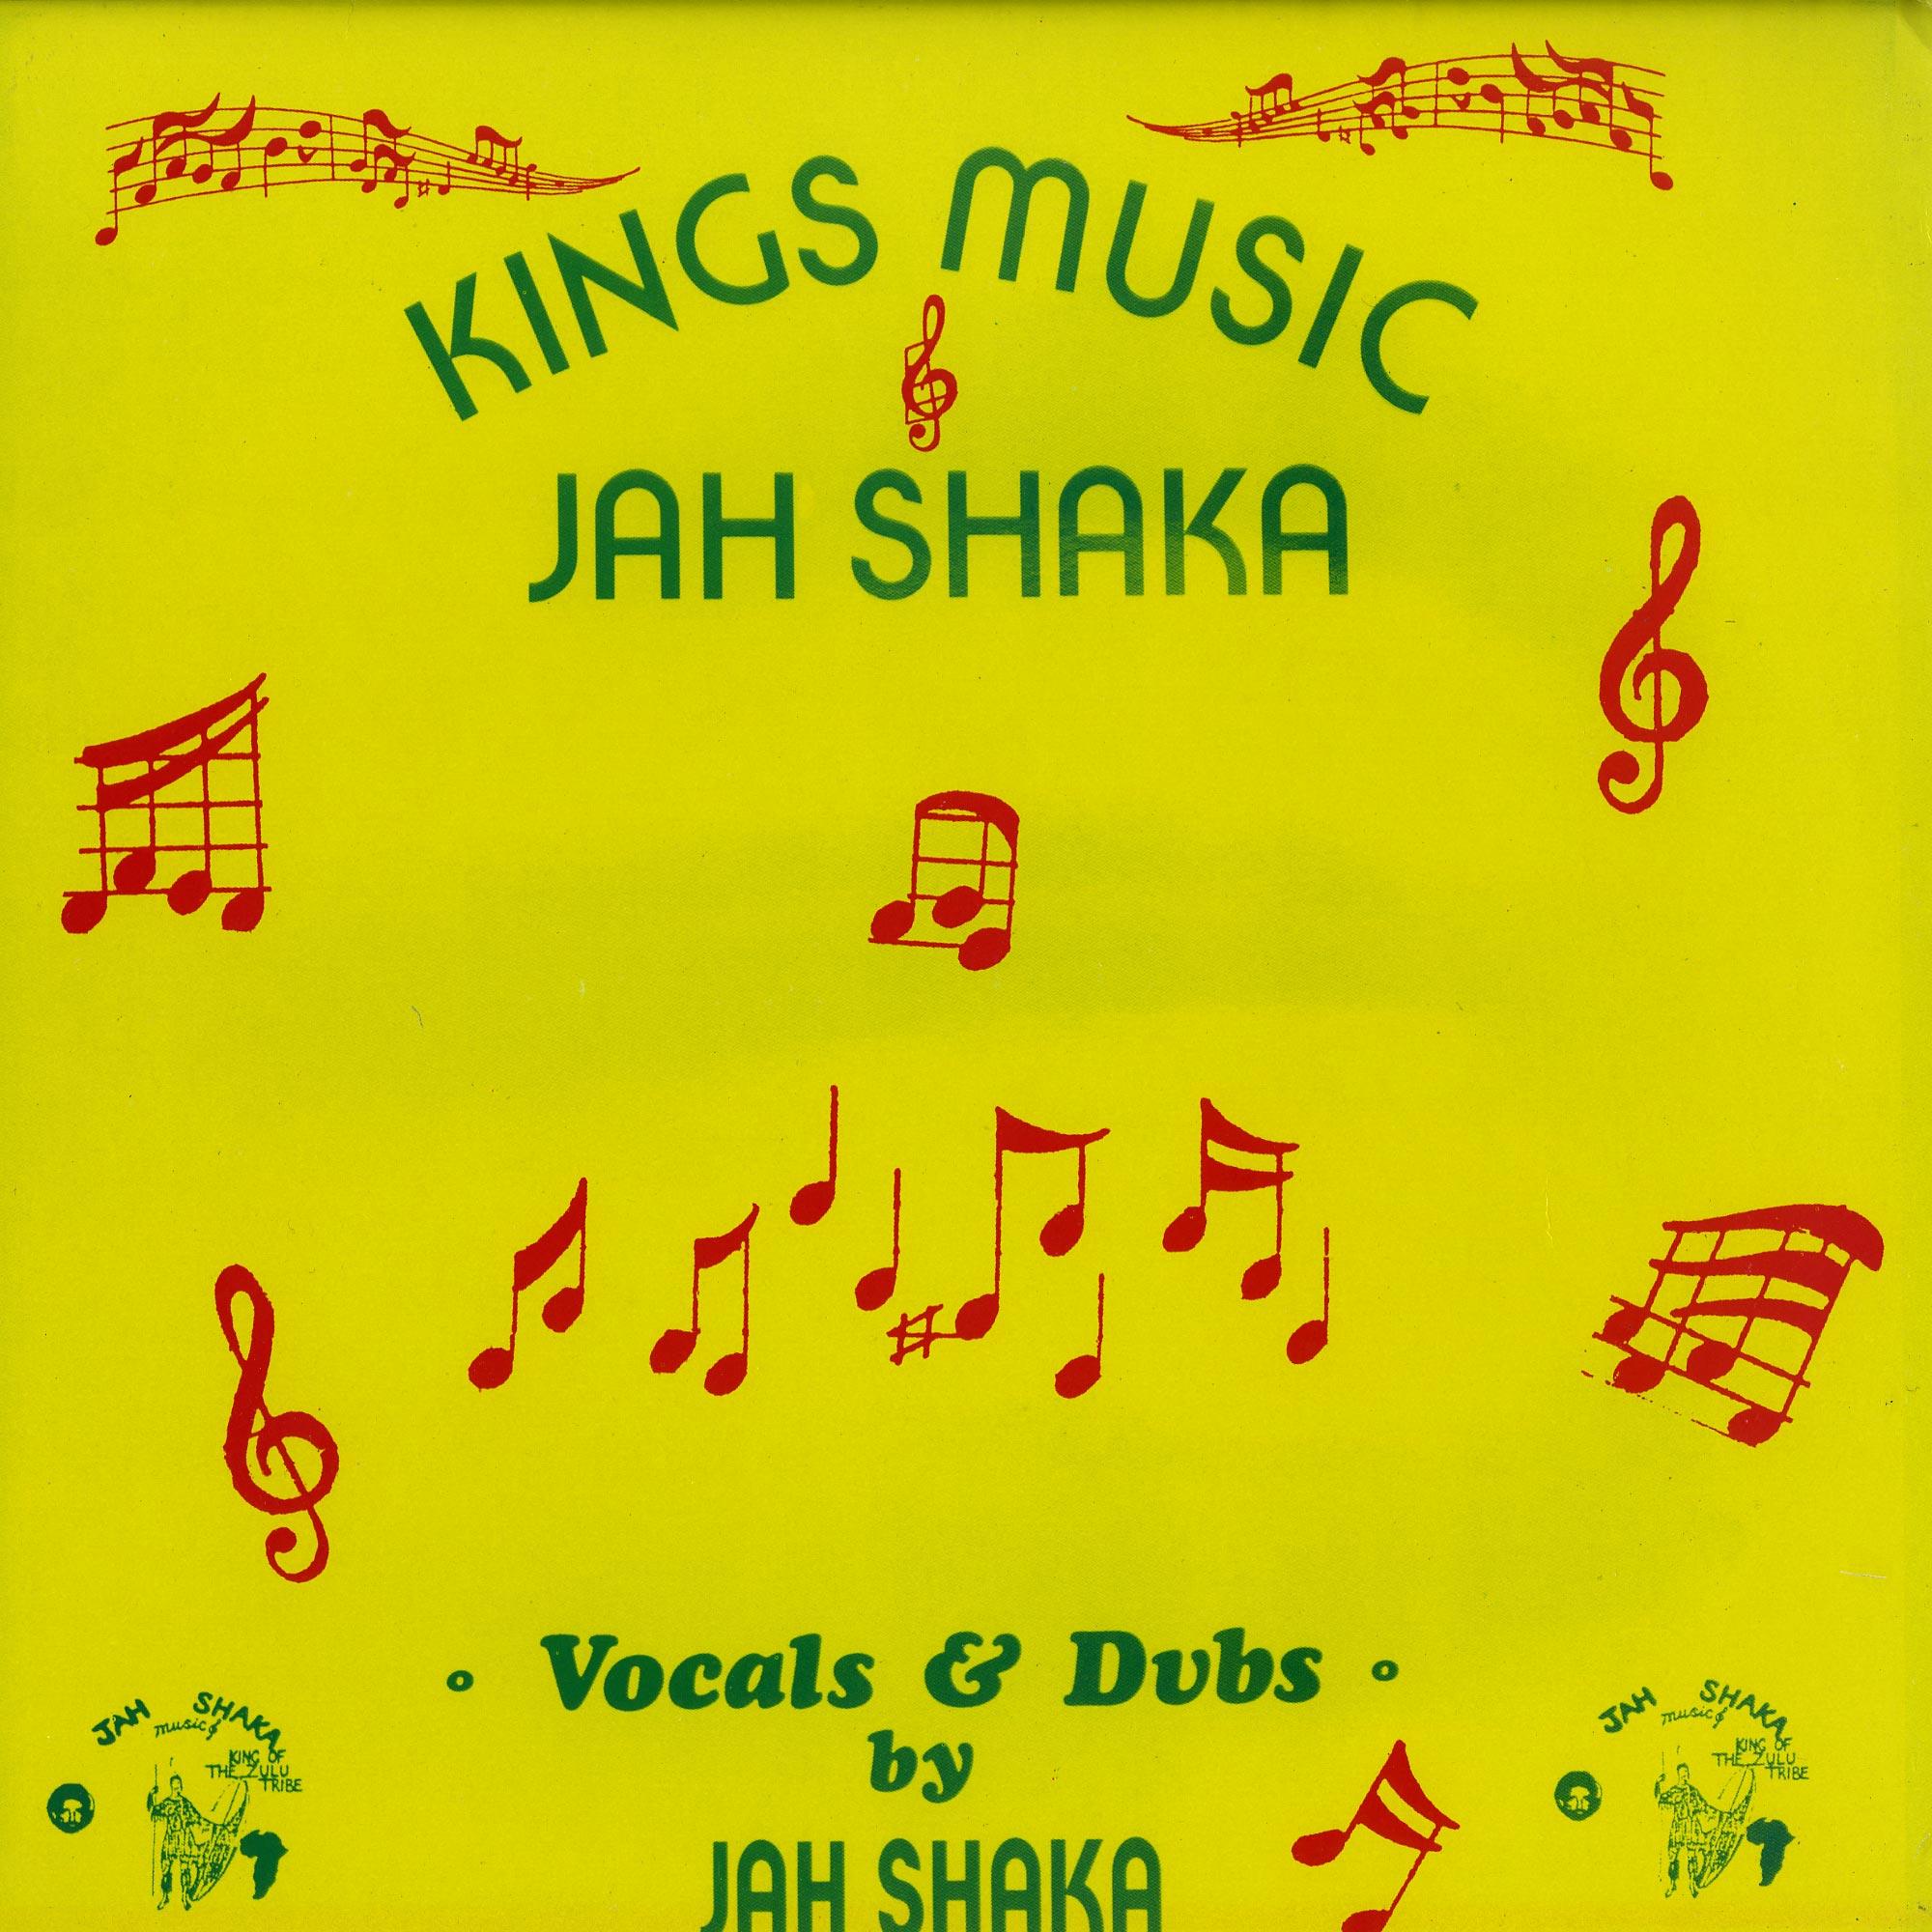 Jah Shaka - KINGS OF MUSIC